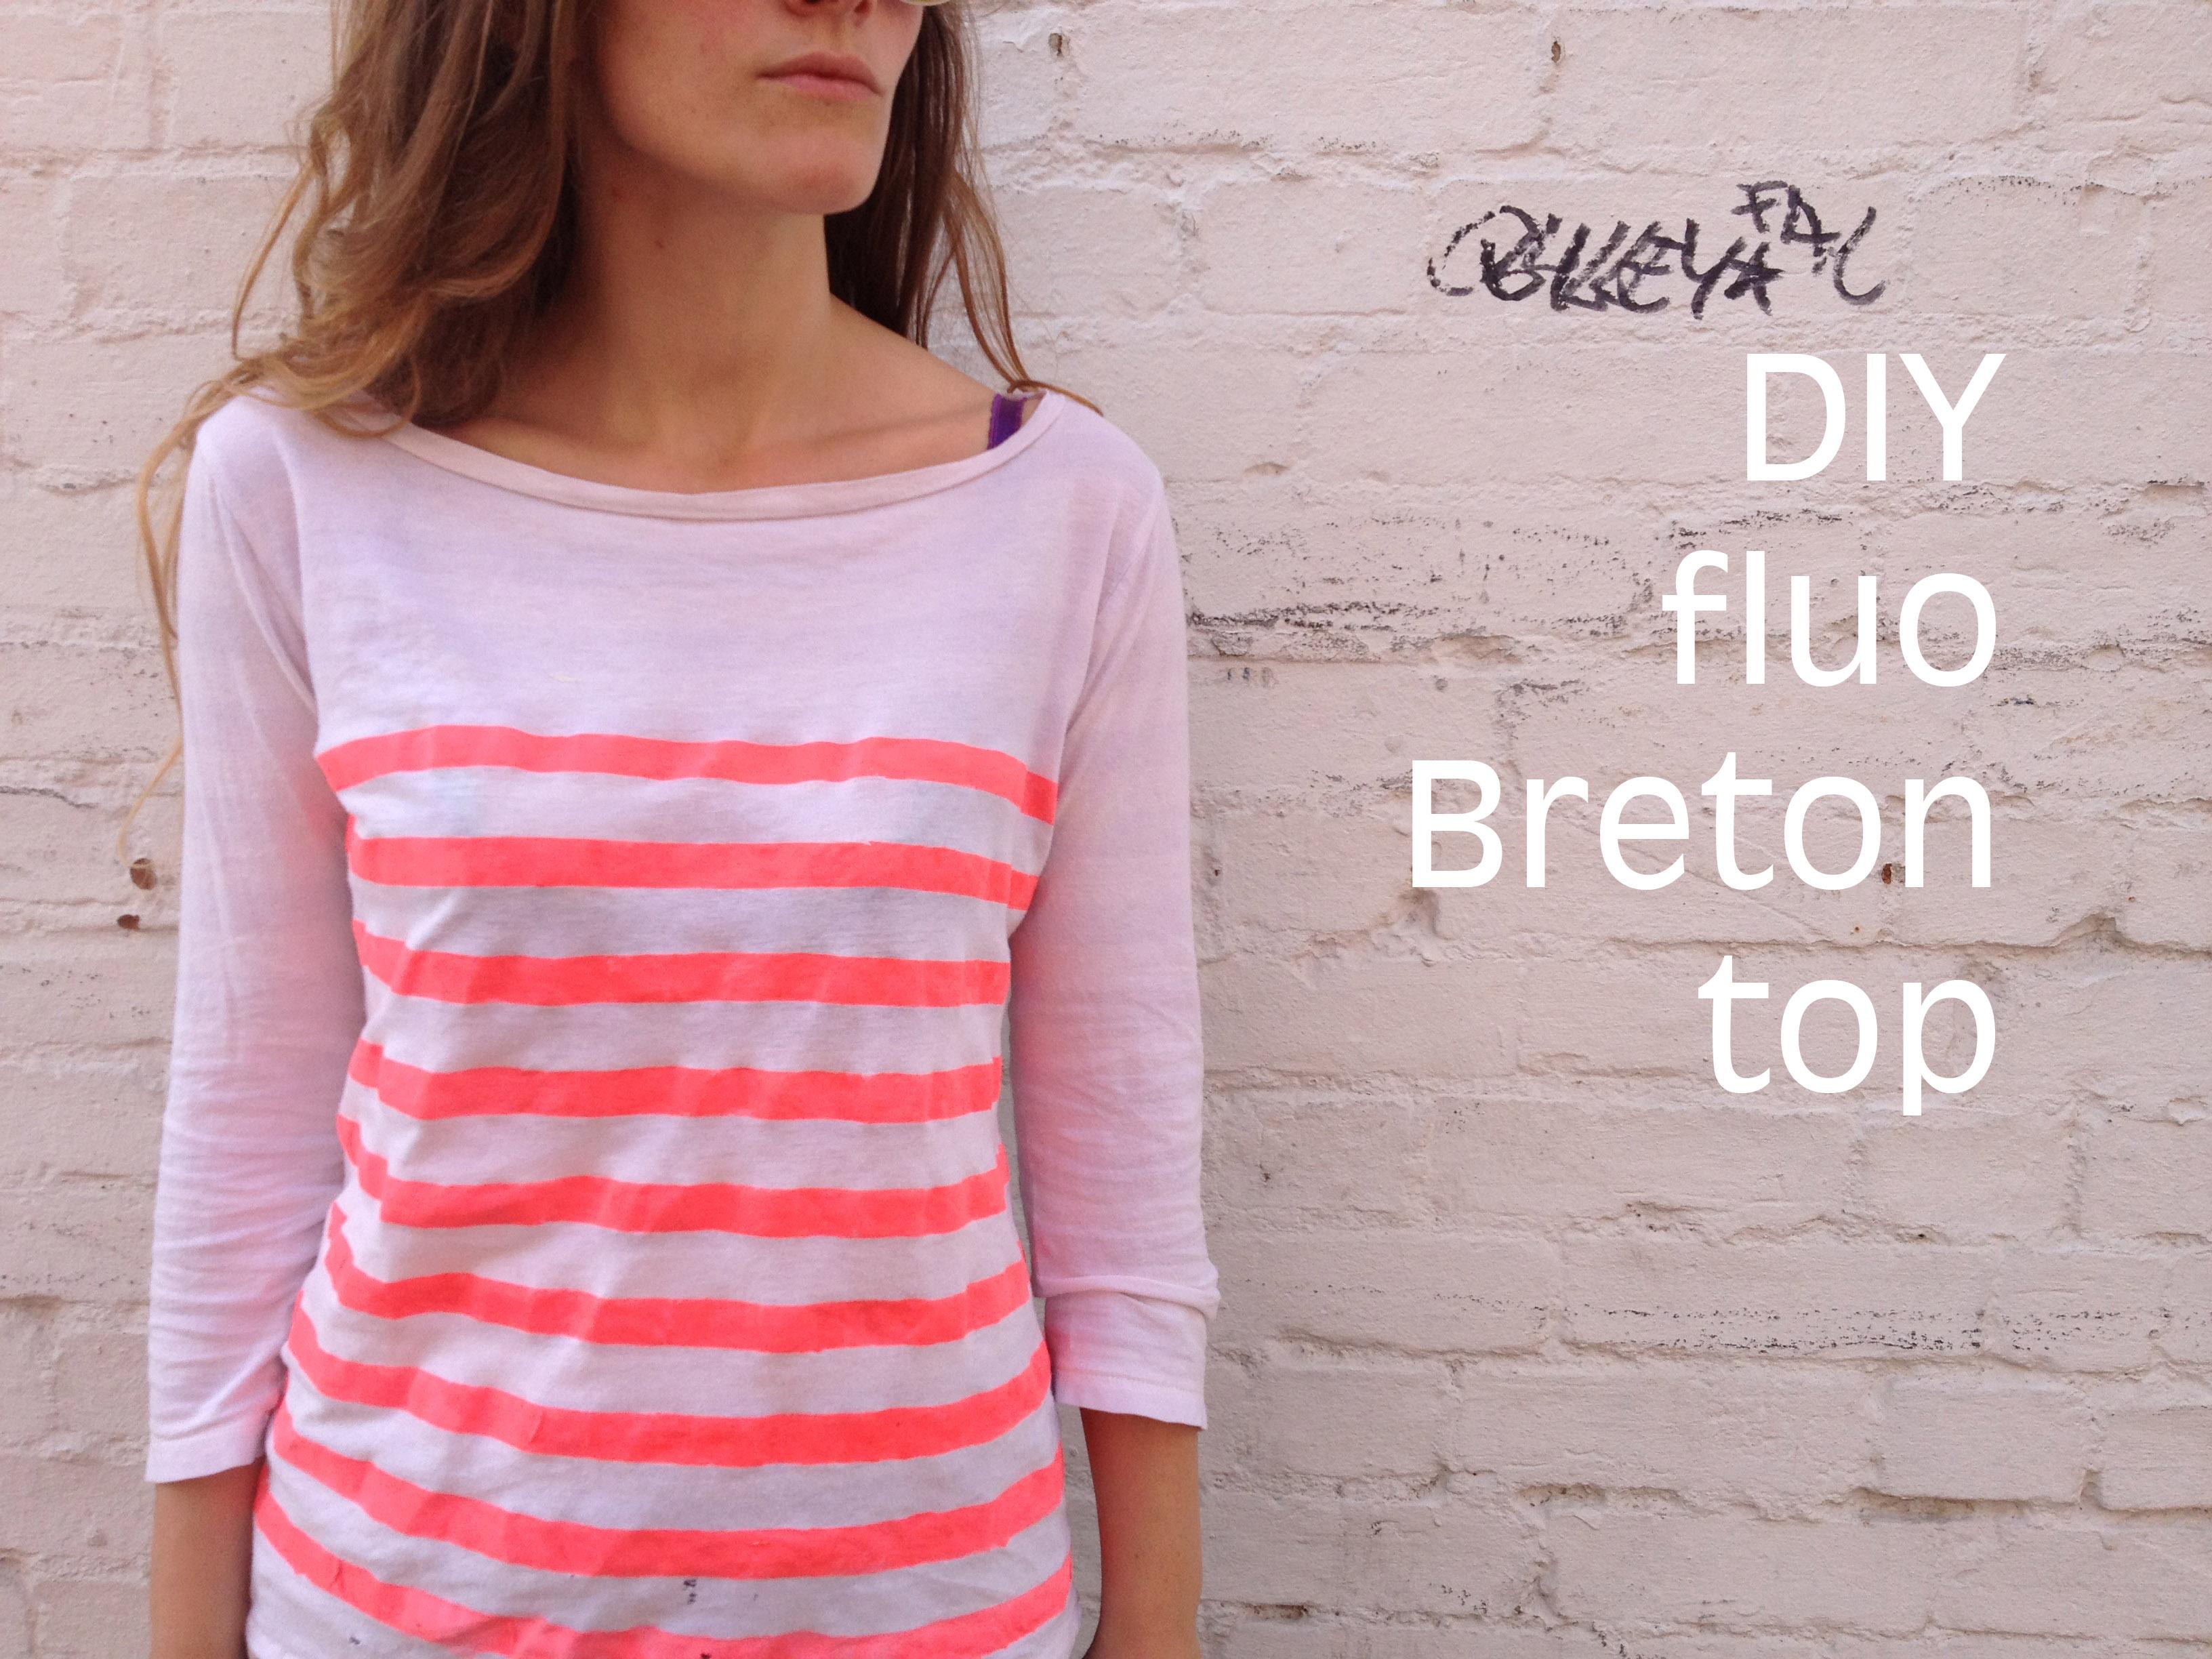 DIY Fluo Breton